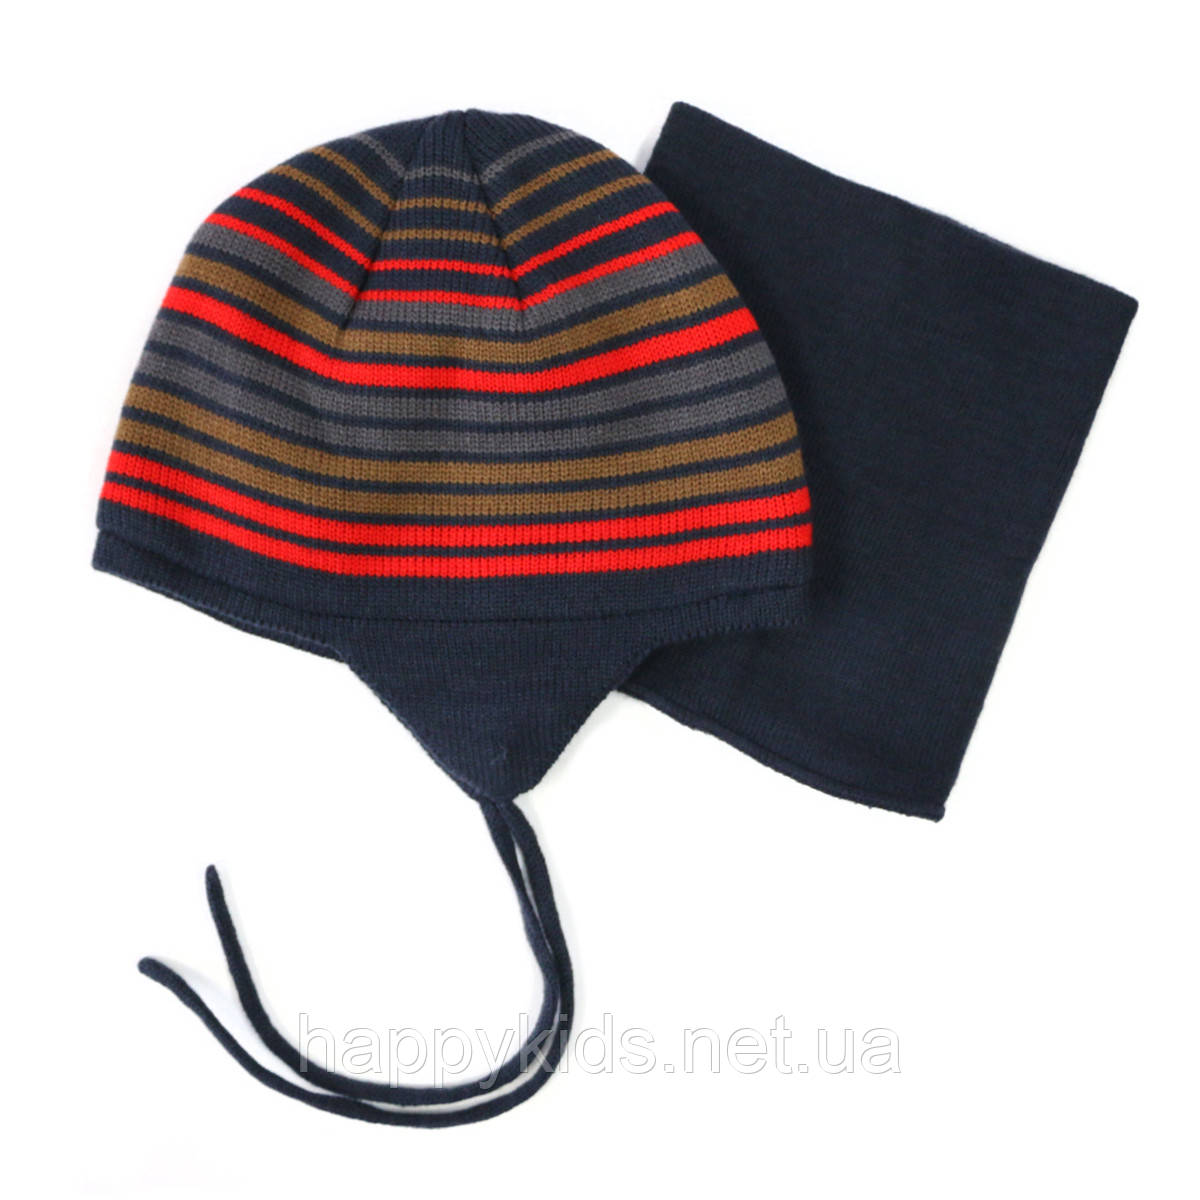 Зимняя шапка+манишка для мальчика PELUCHE 79 EG Spicy. Размер 3/5 и 6/8.